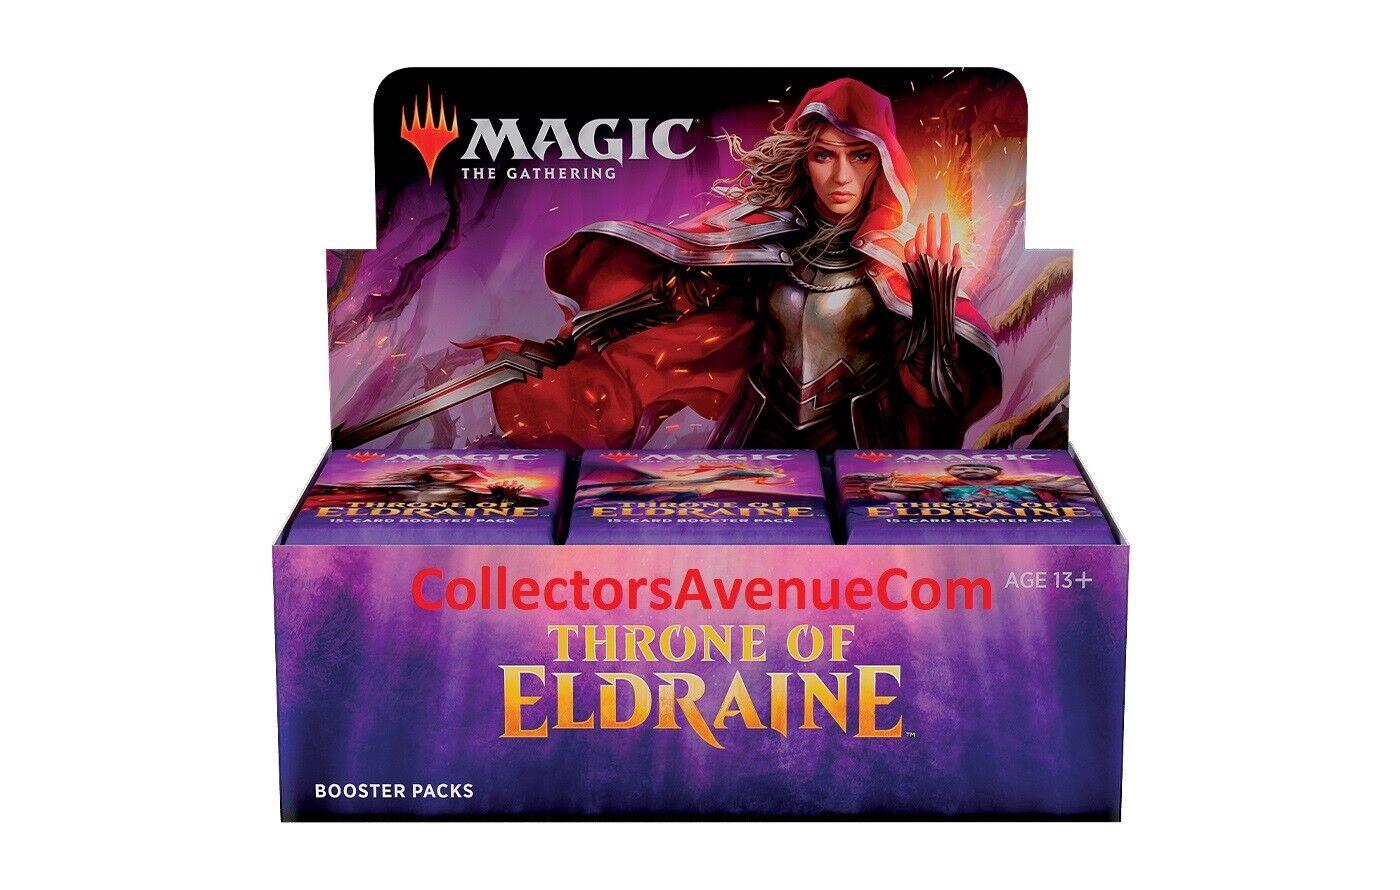 Eldren Kings help Box mtg Magic sellation avenuecom